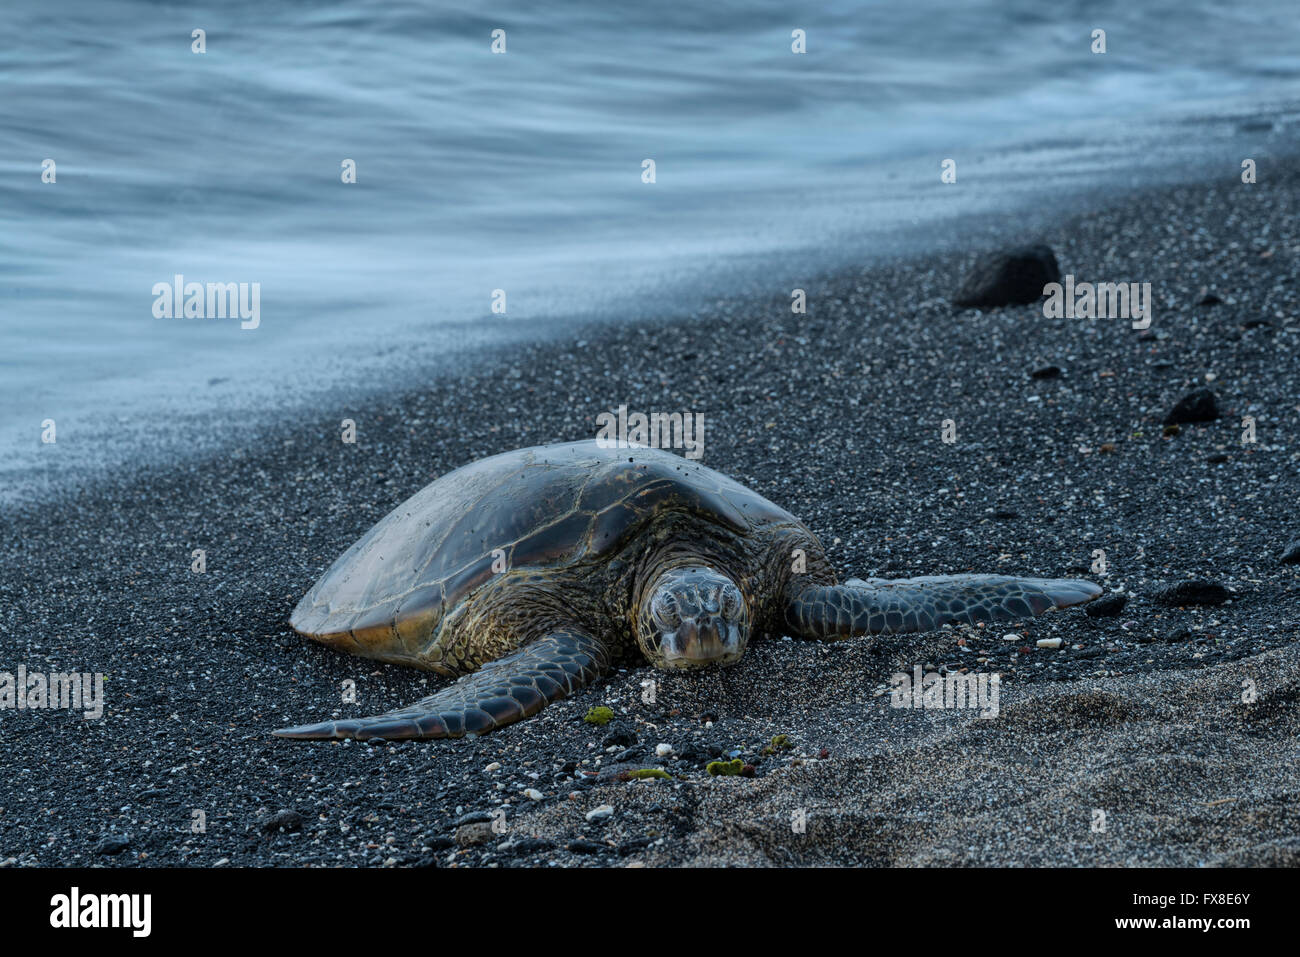 Stati Uniti d'America, Hawaii, grande isola, Kona, Kaloko-Honokohau storica national park, tartarughe di mare sulla spiaggia, Foto Stock